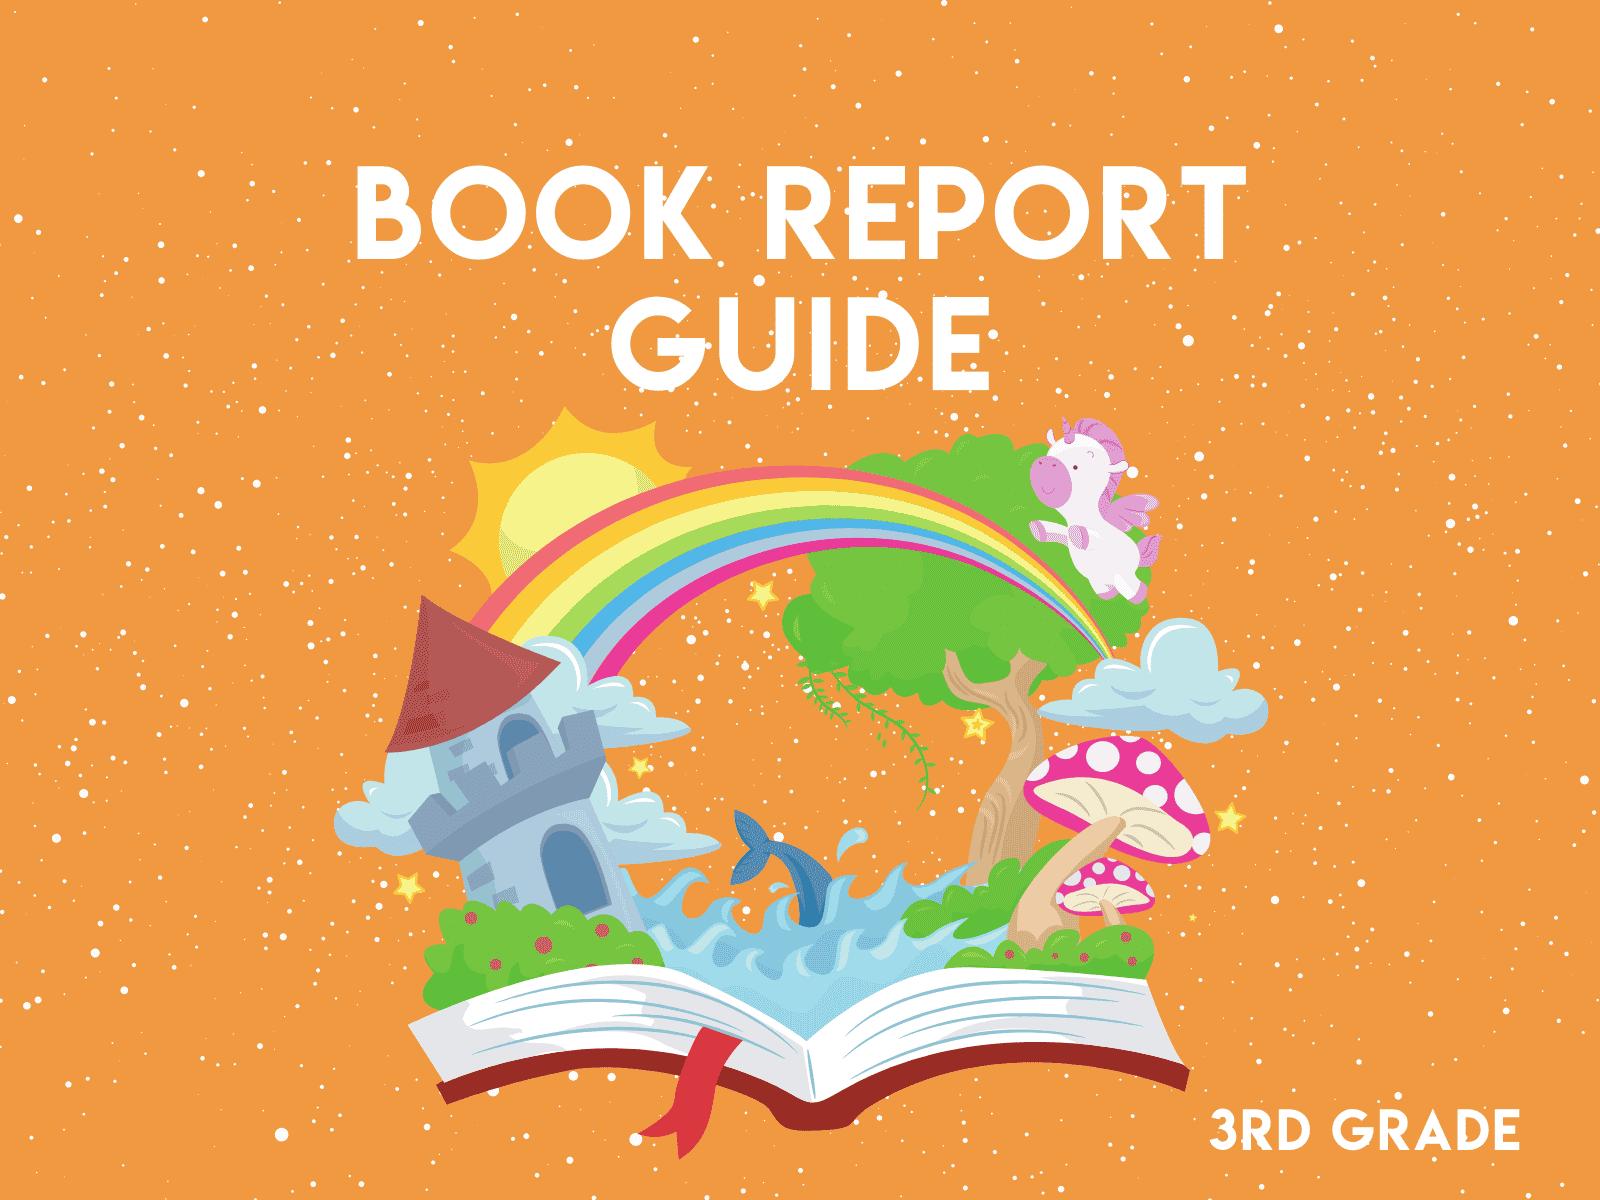 3rd Grade Book Report Guide